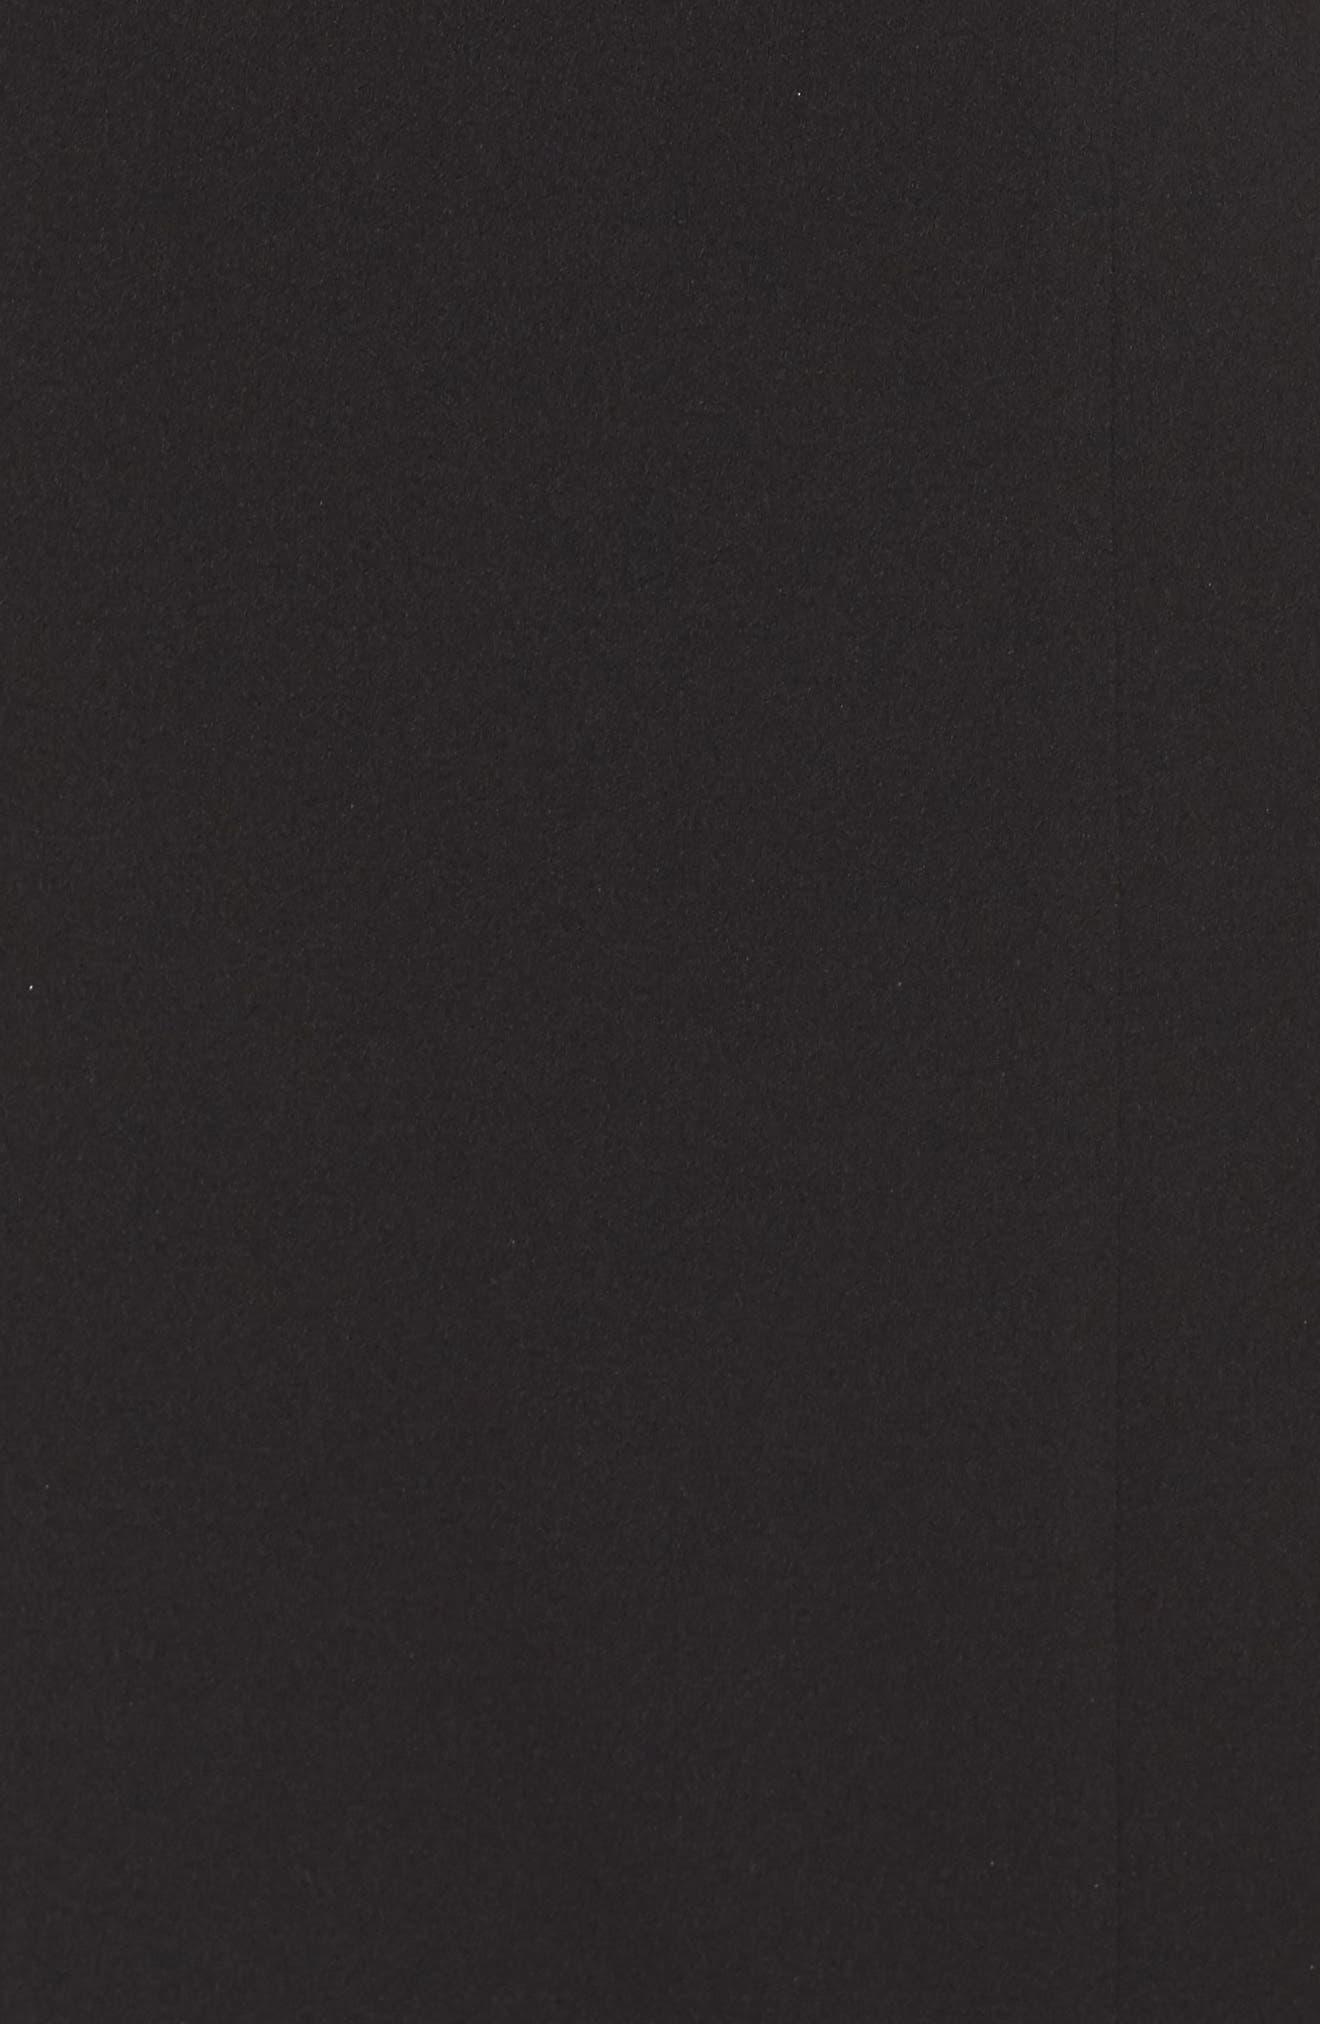 Crepe One-Shoulder Cape Dress,                             Alternate thumbnail 5, color,                             Black/ Ivory